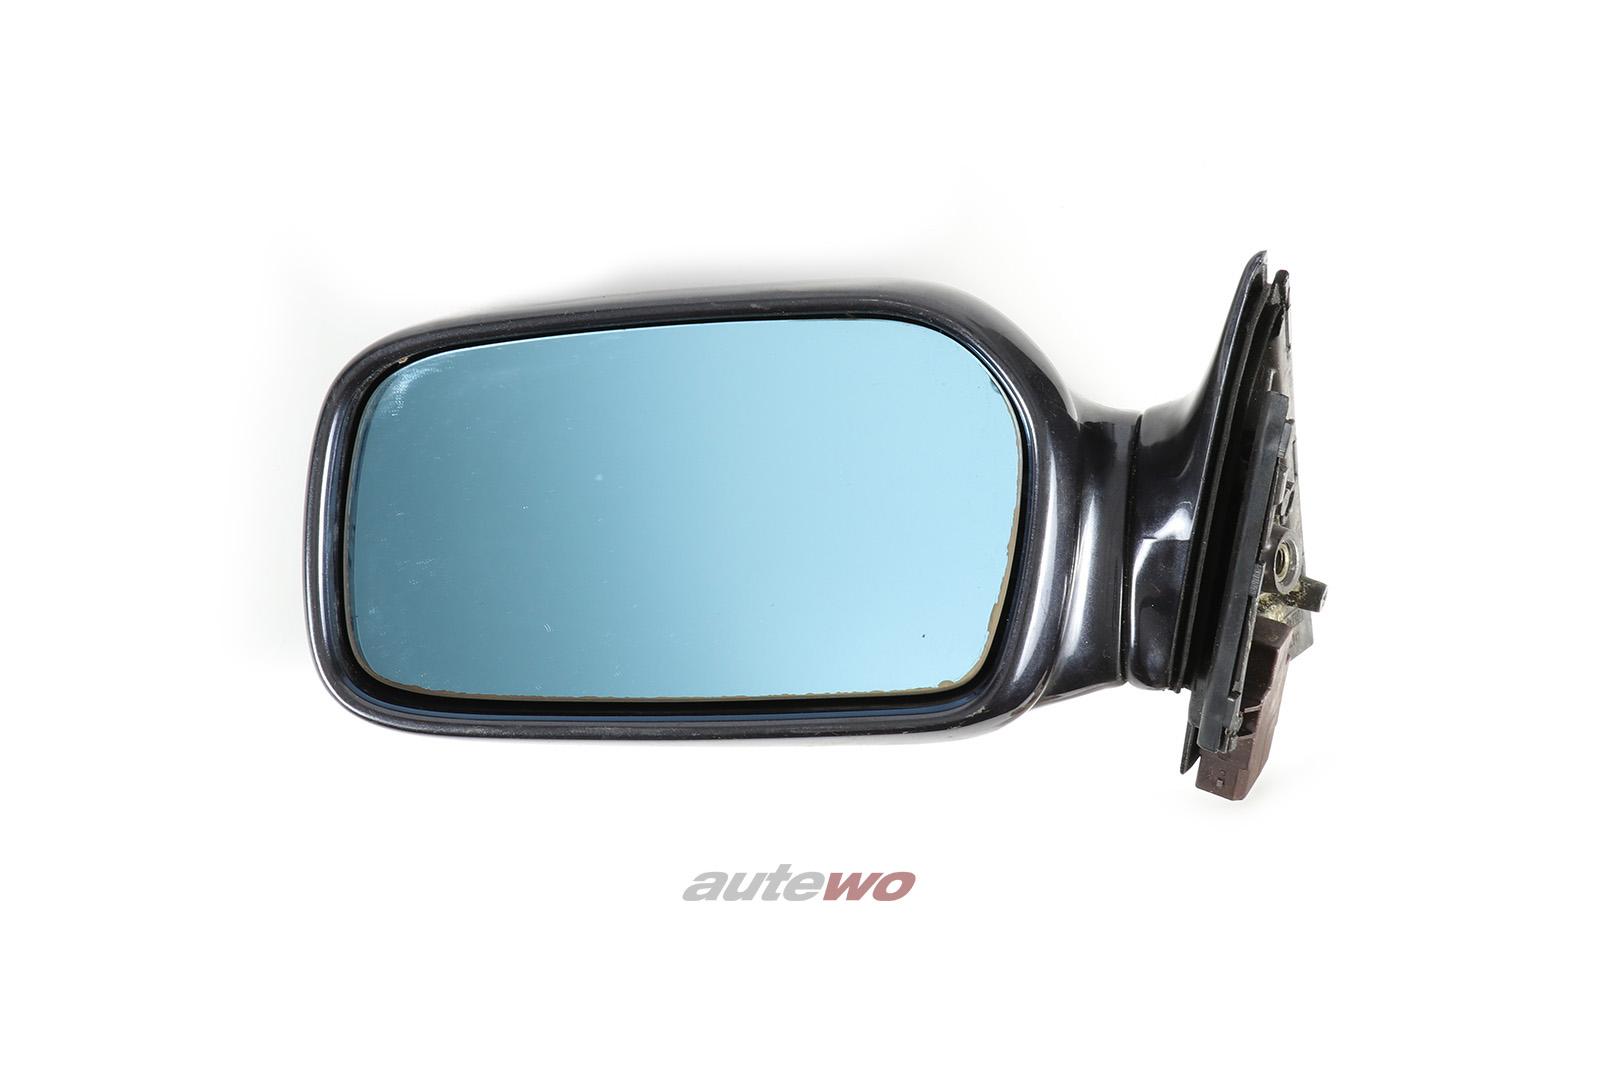 4A1857501H Audi 100/S4 C4 elektr. Außenspiegel Links amethyst